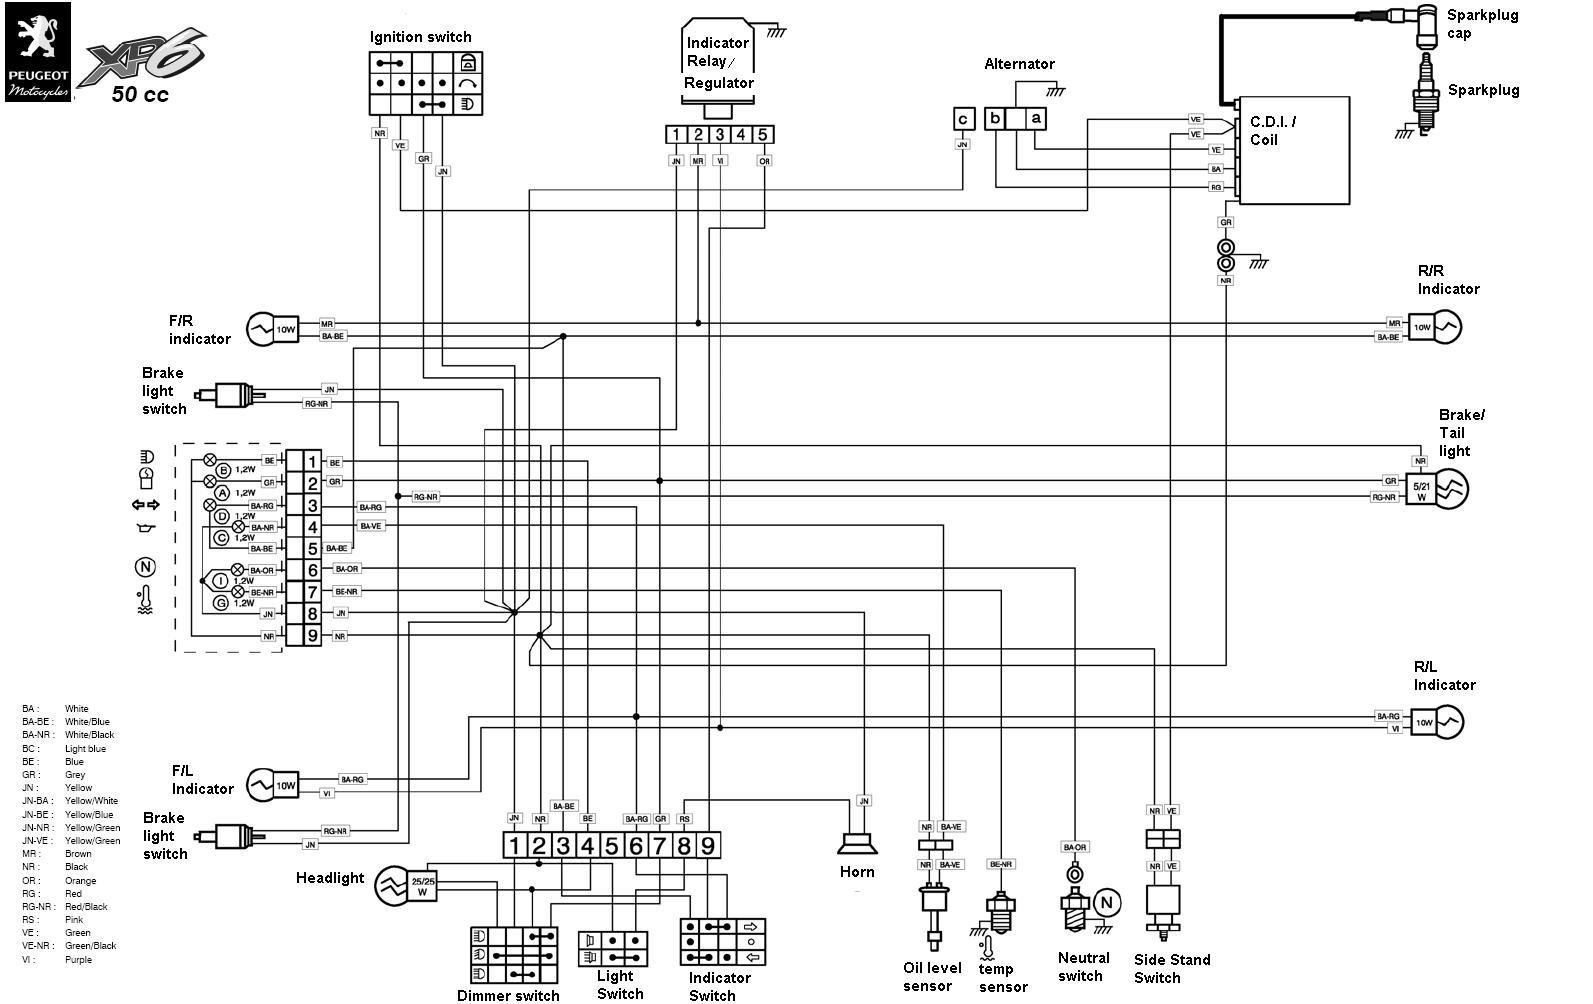 Peugeot Elyseo Wiring Diagram Fuse Box Diagrams Motorcycle Manuals Pdf Fault Codes Rh Manual Com Elystar 50 125